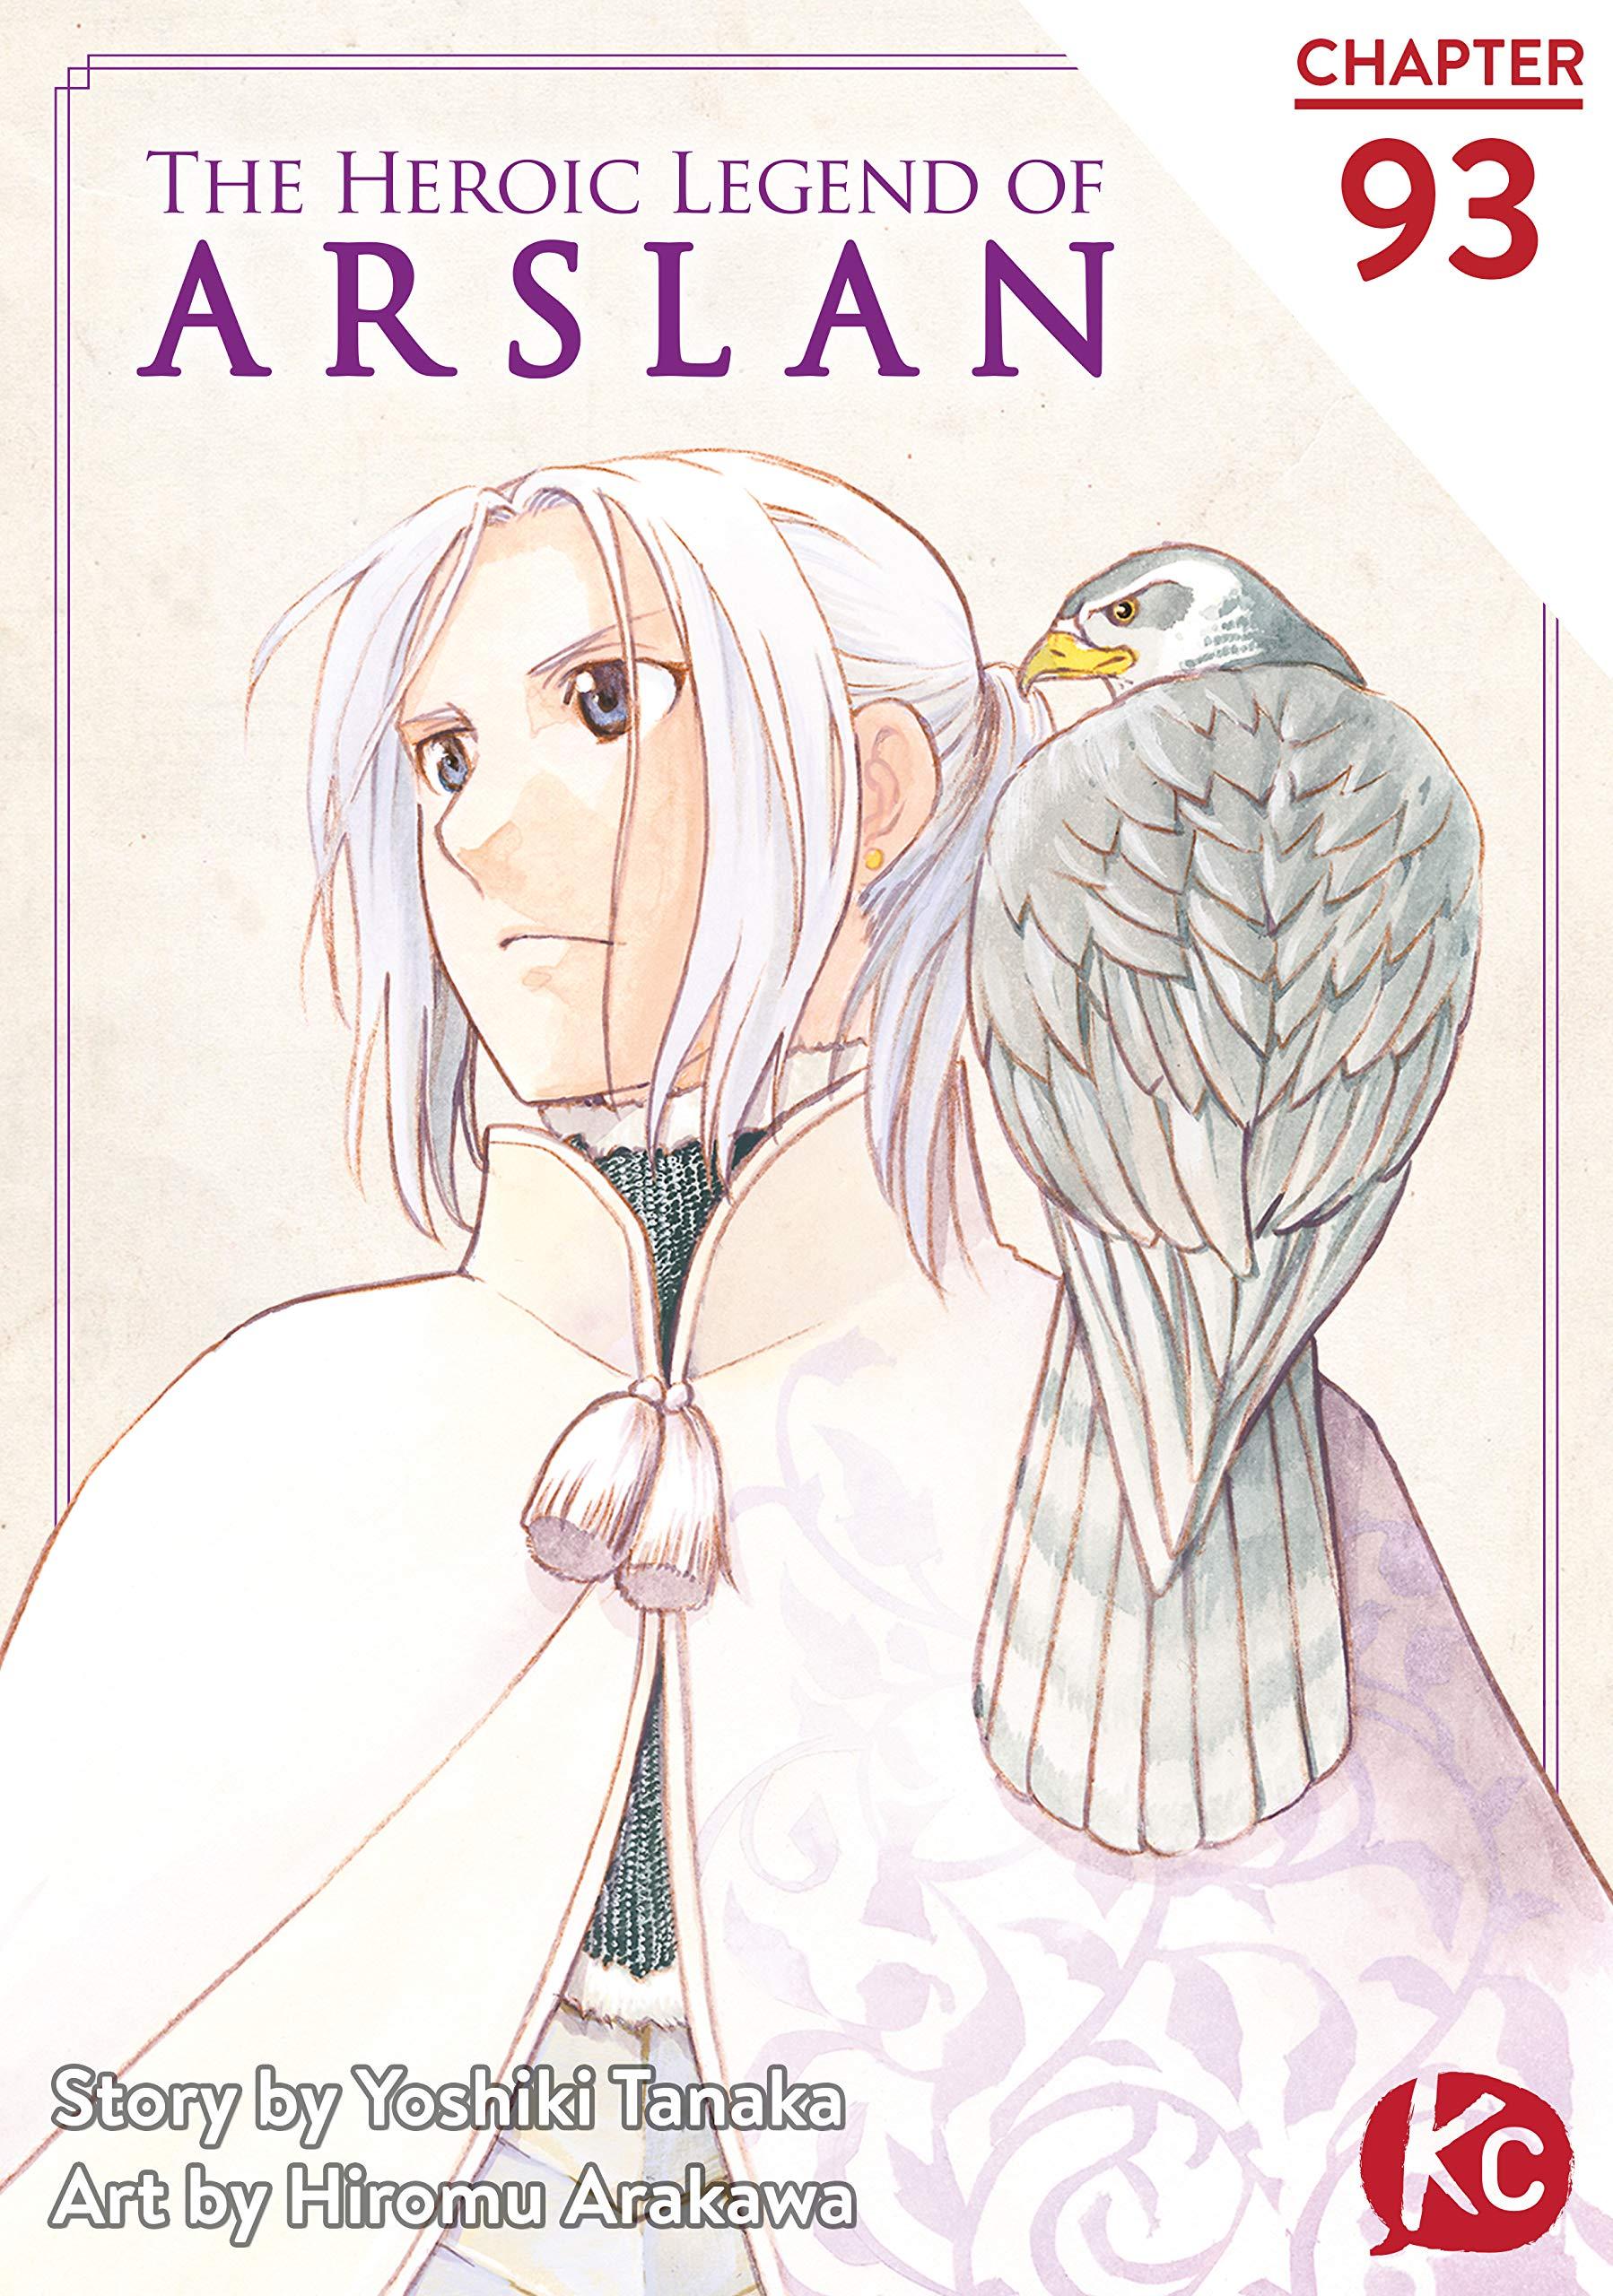 The Heroic Legend of Arslan #93